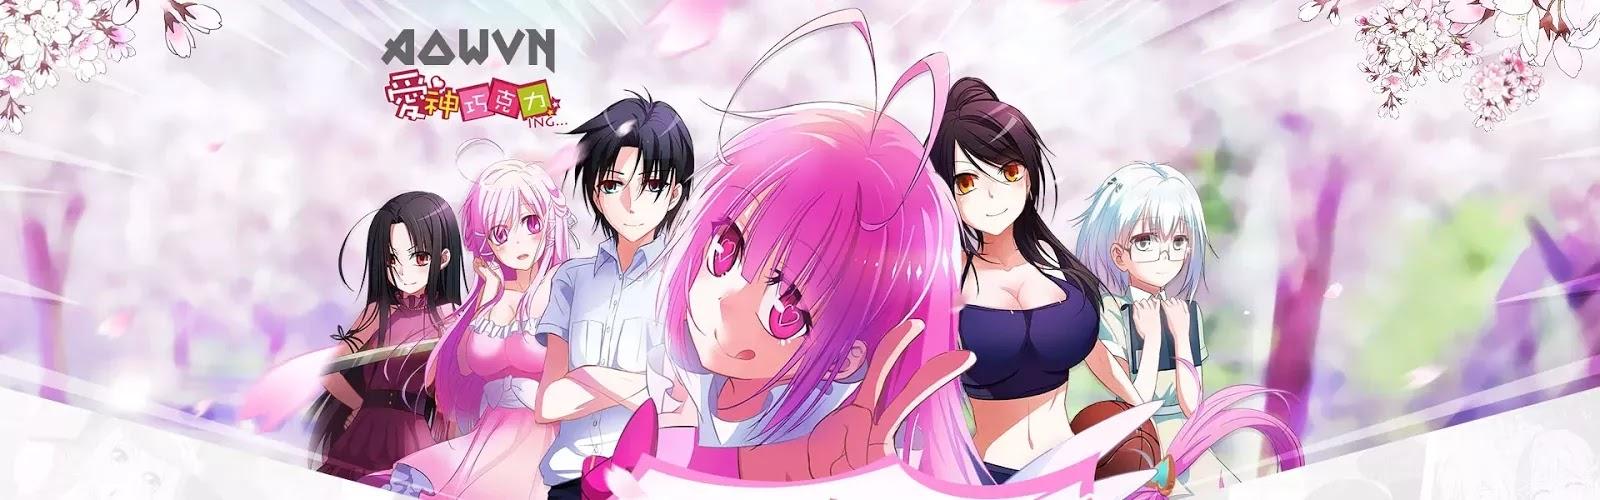 AowVN.org minz%2B%25283%2529 - [ Anime 3gp Mp4 ] Cupid's Chocolates | Vietsub - Harem Hay